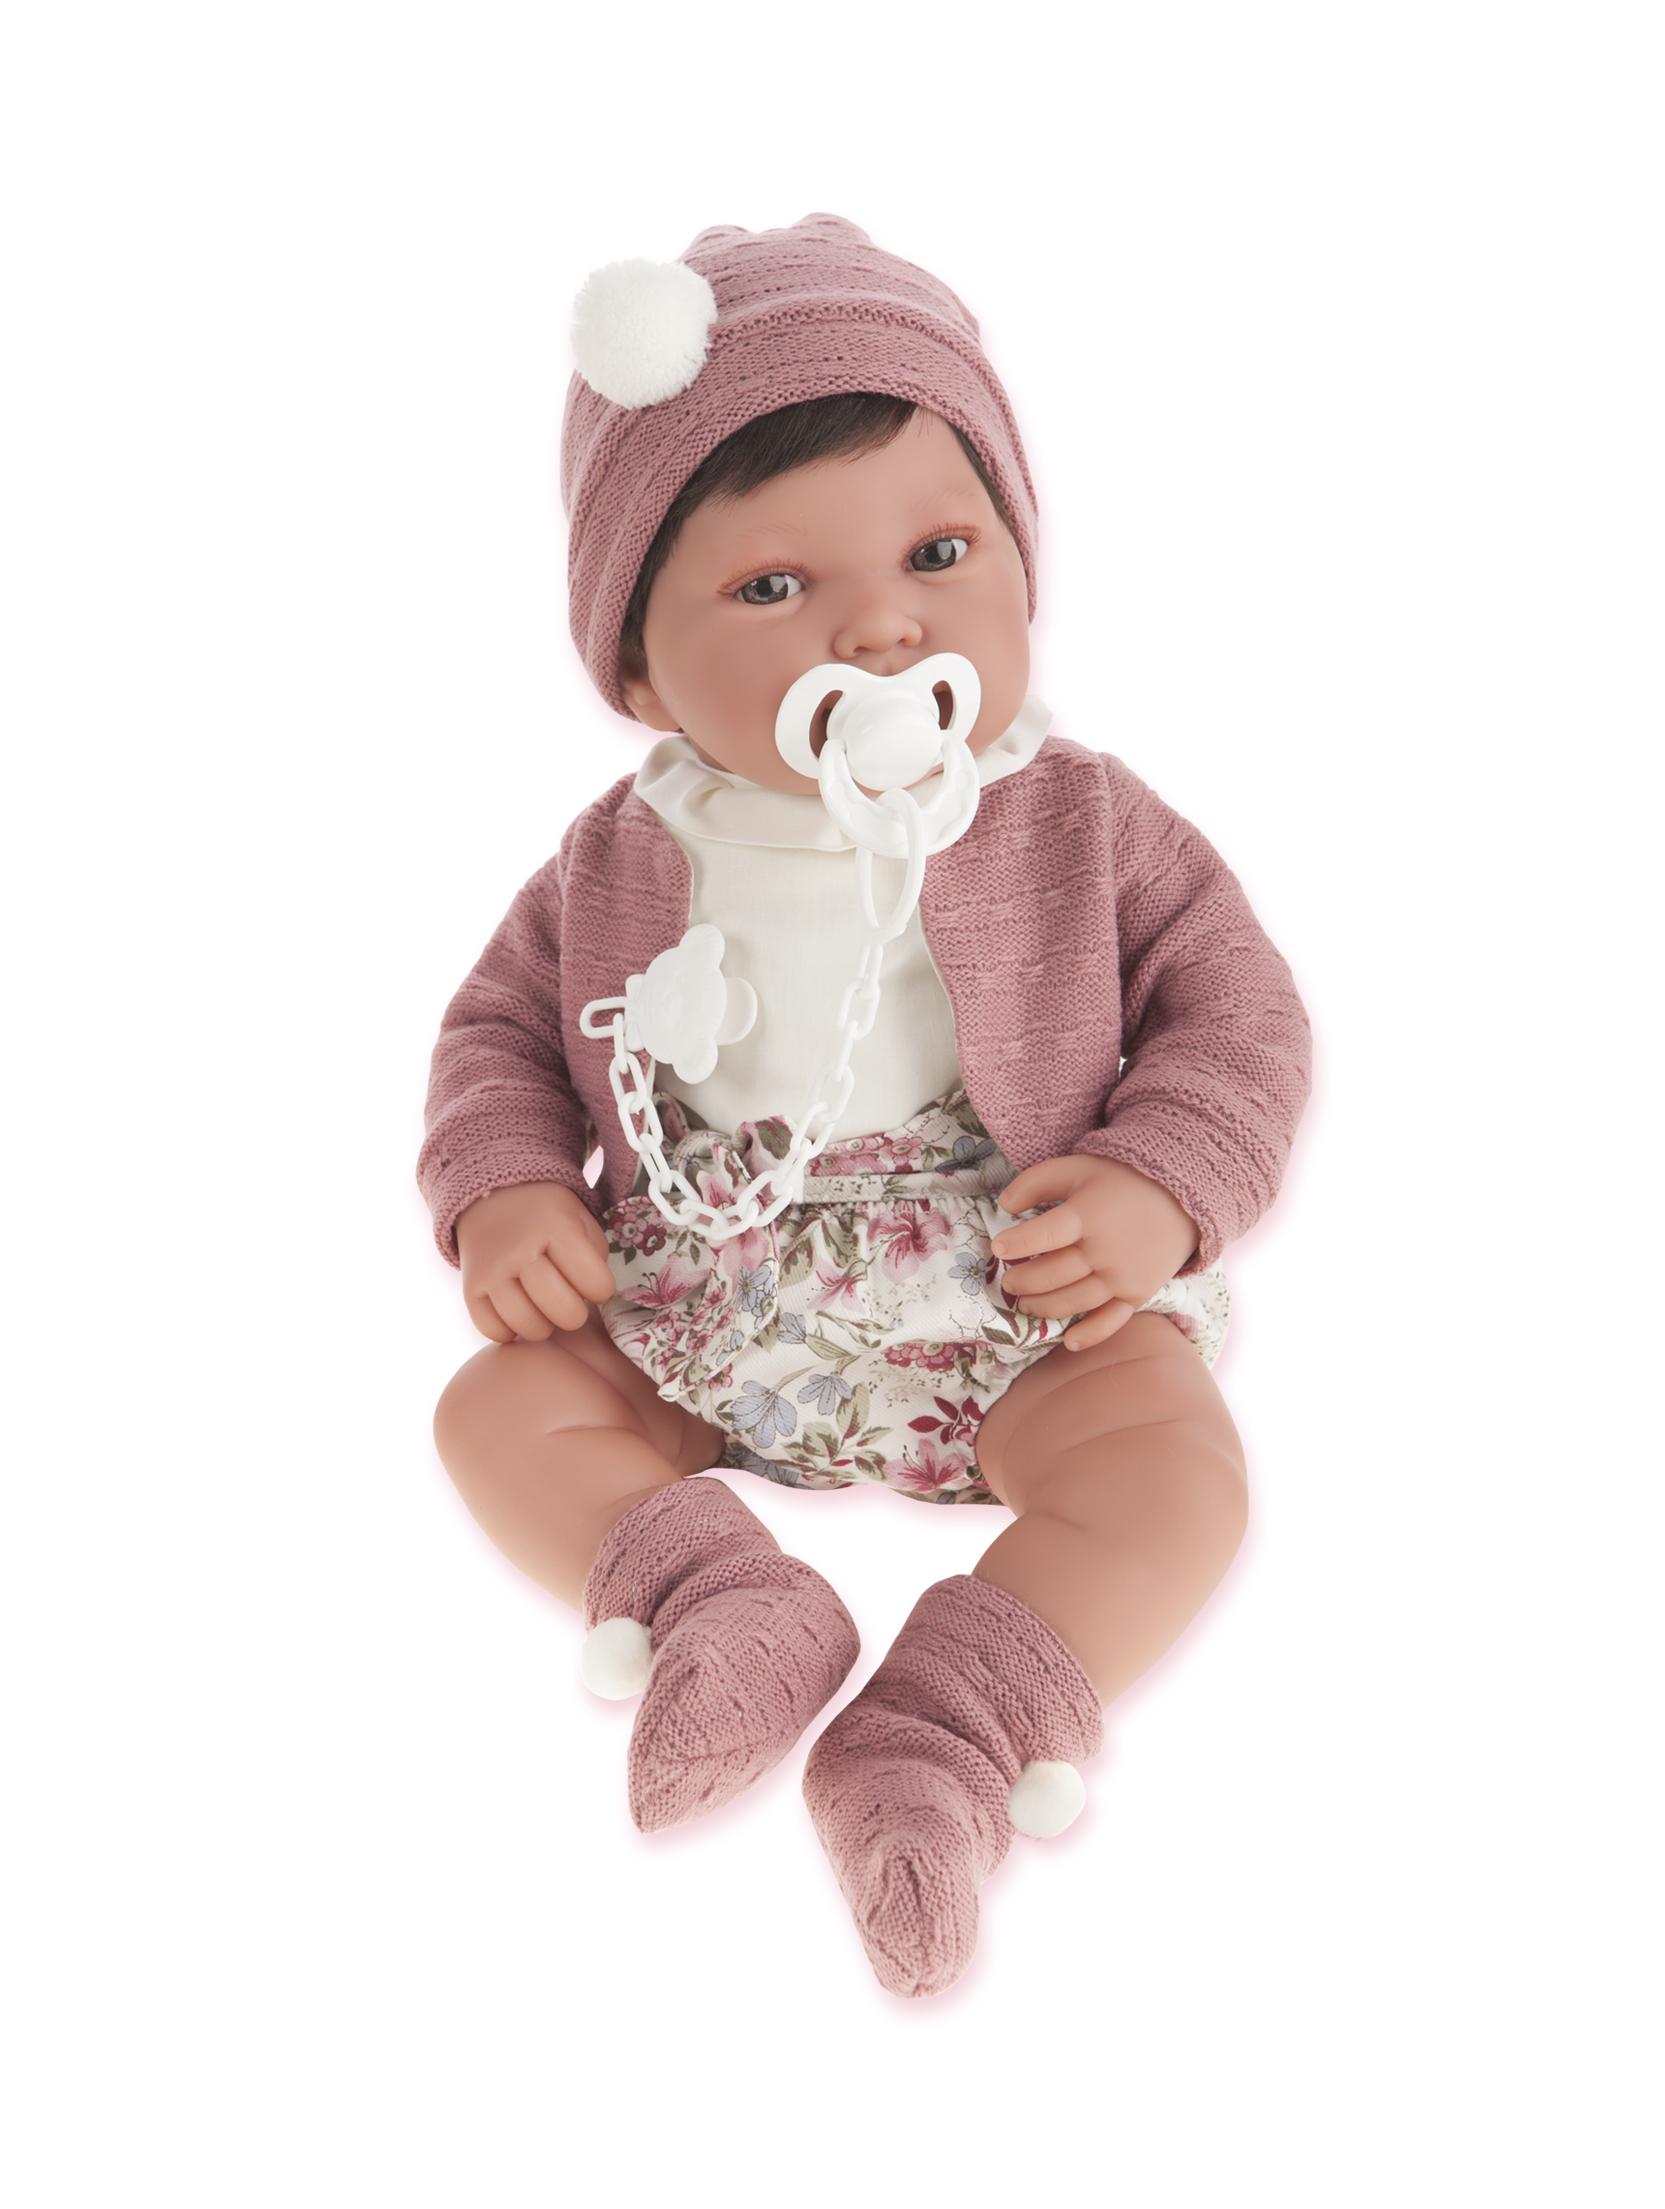 Antonio Juan 3369W Кукла Сэнди в розовом,40 см